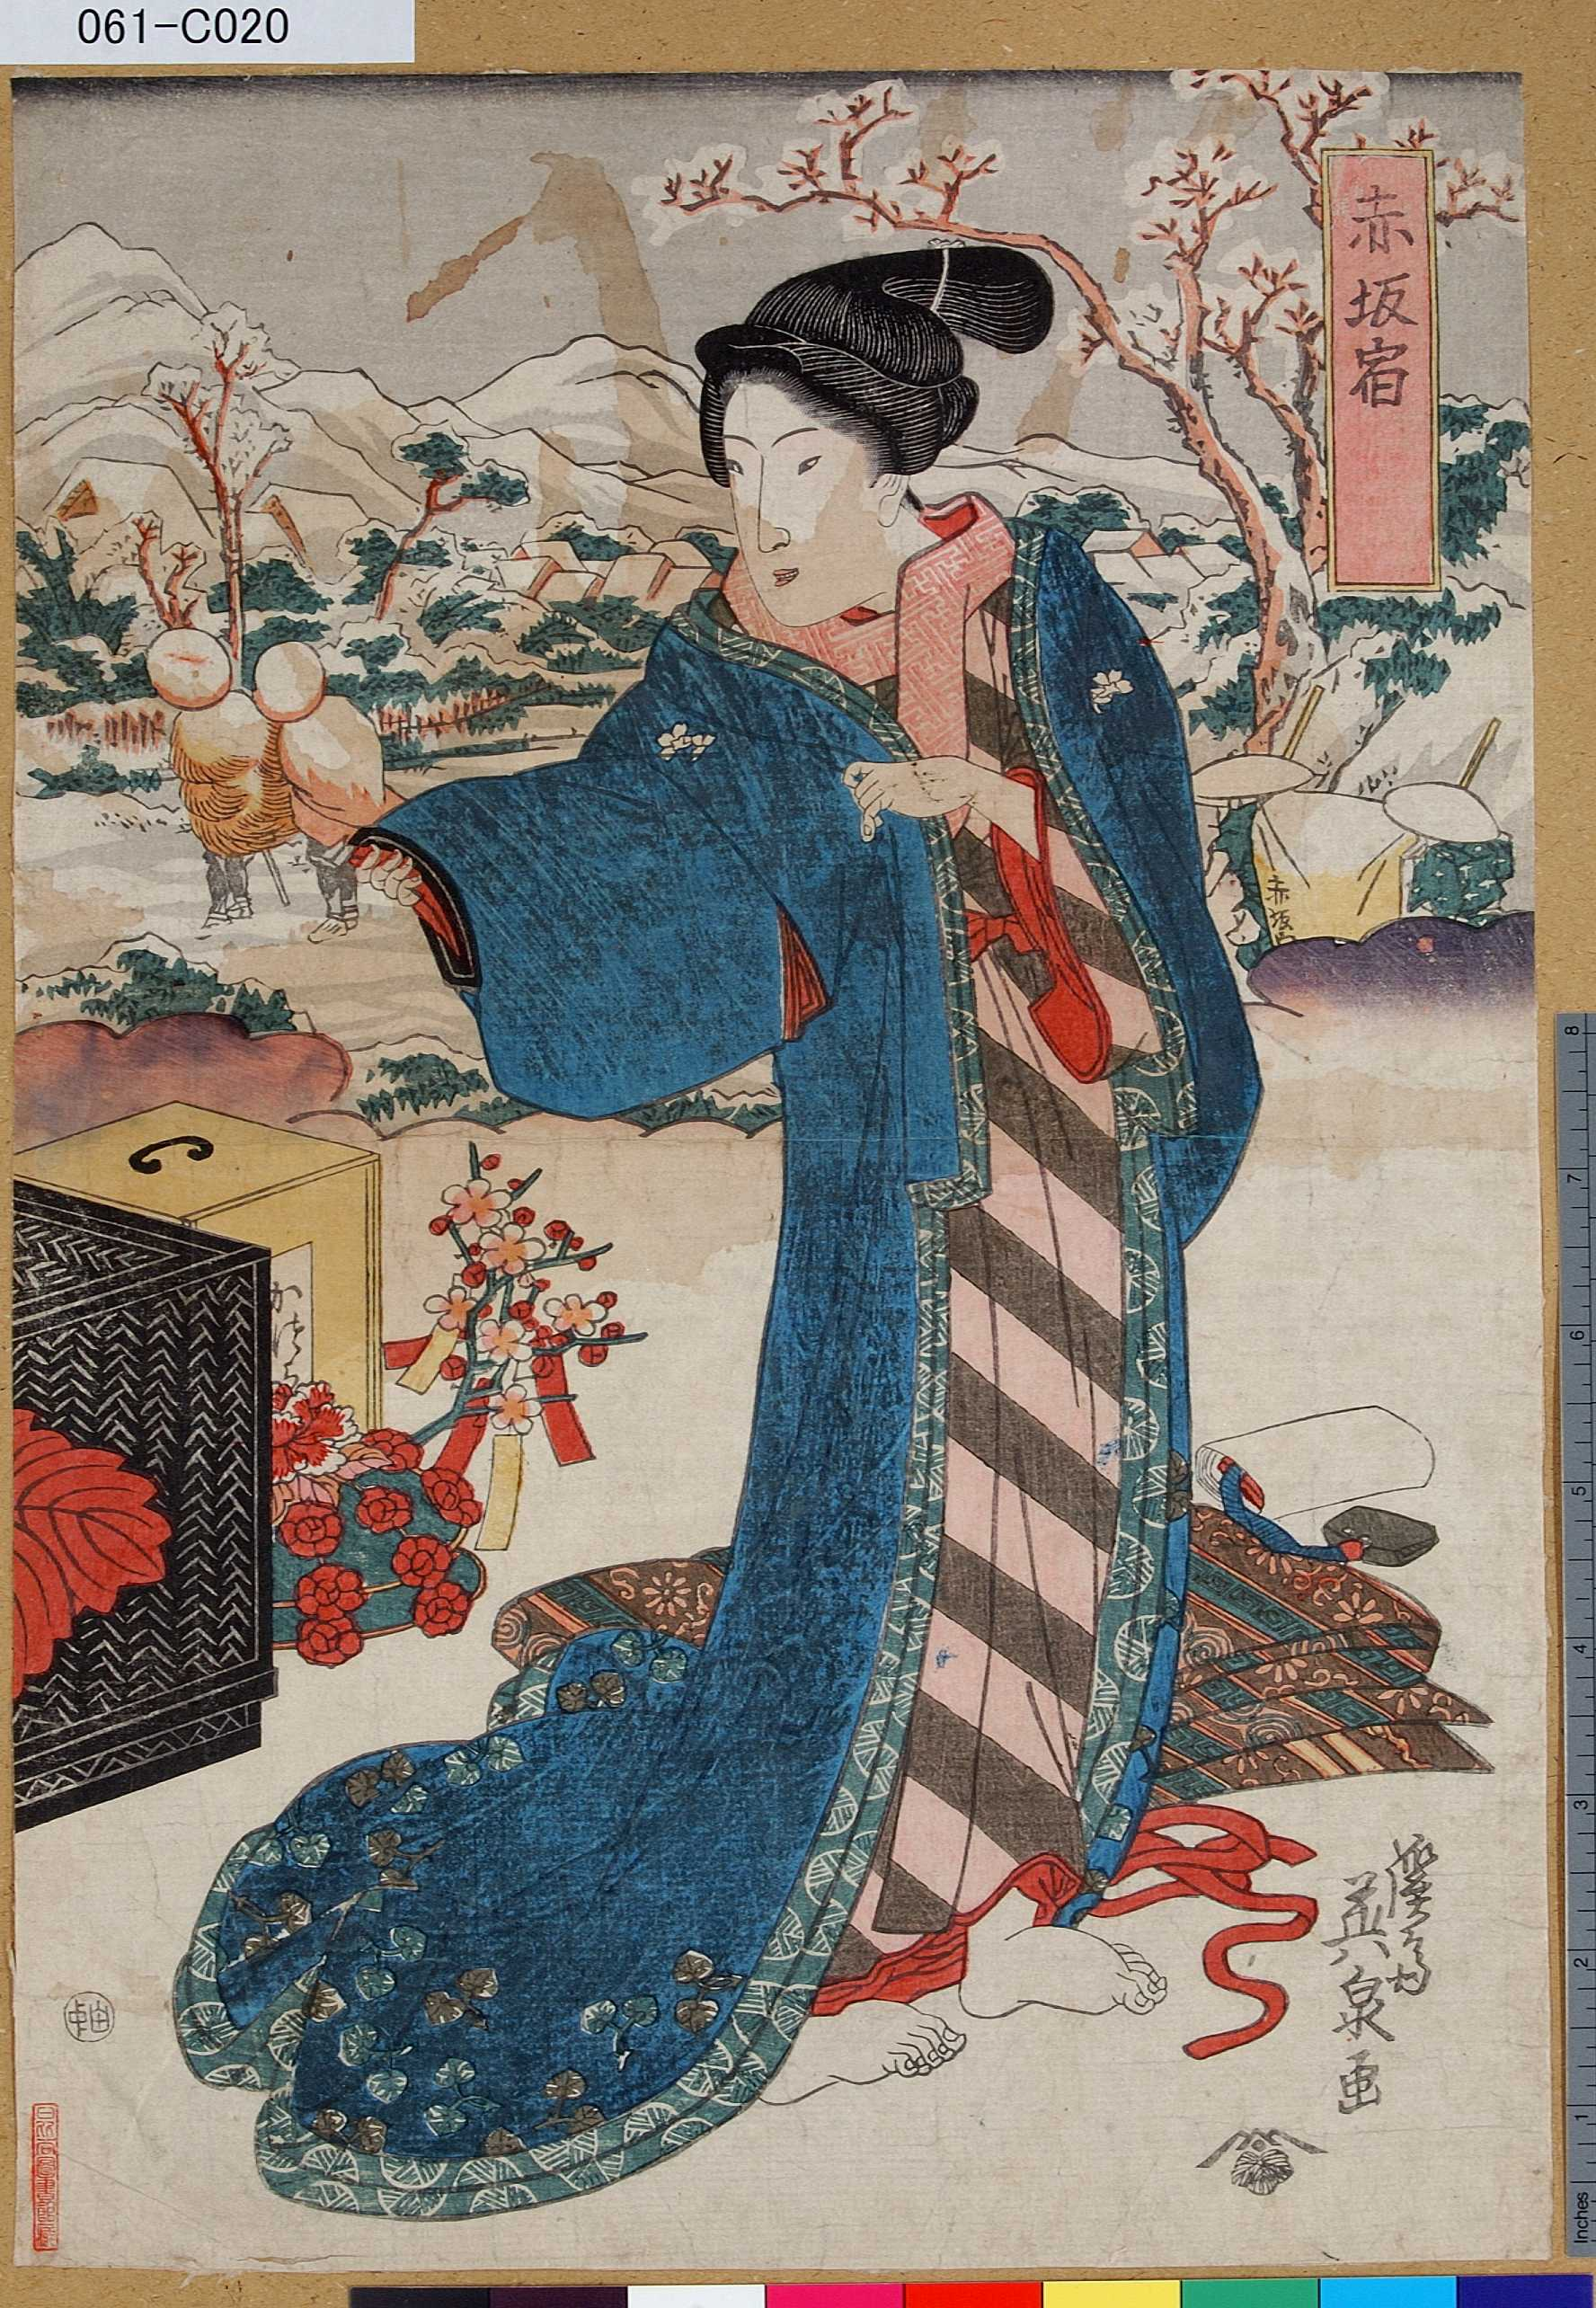 https://data.ukiyo-e.org/metro/images/061-C020.jpg